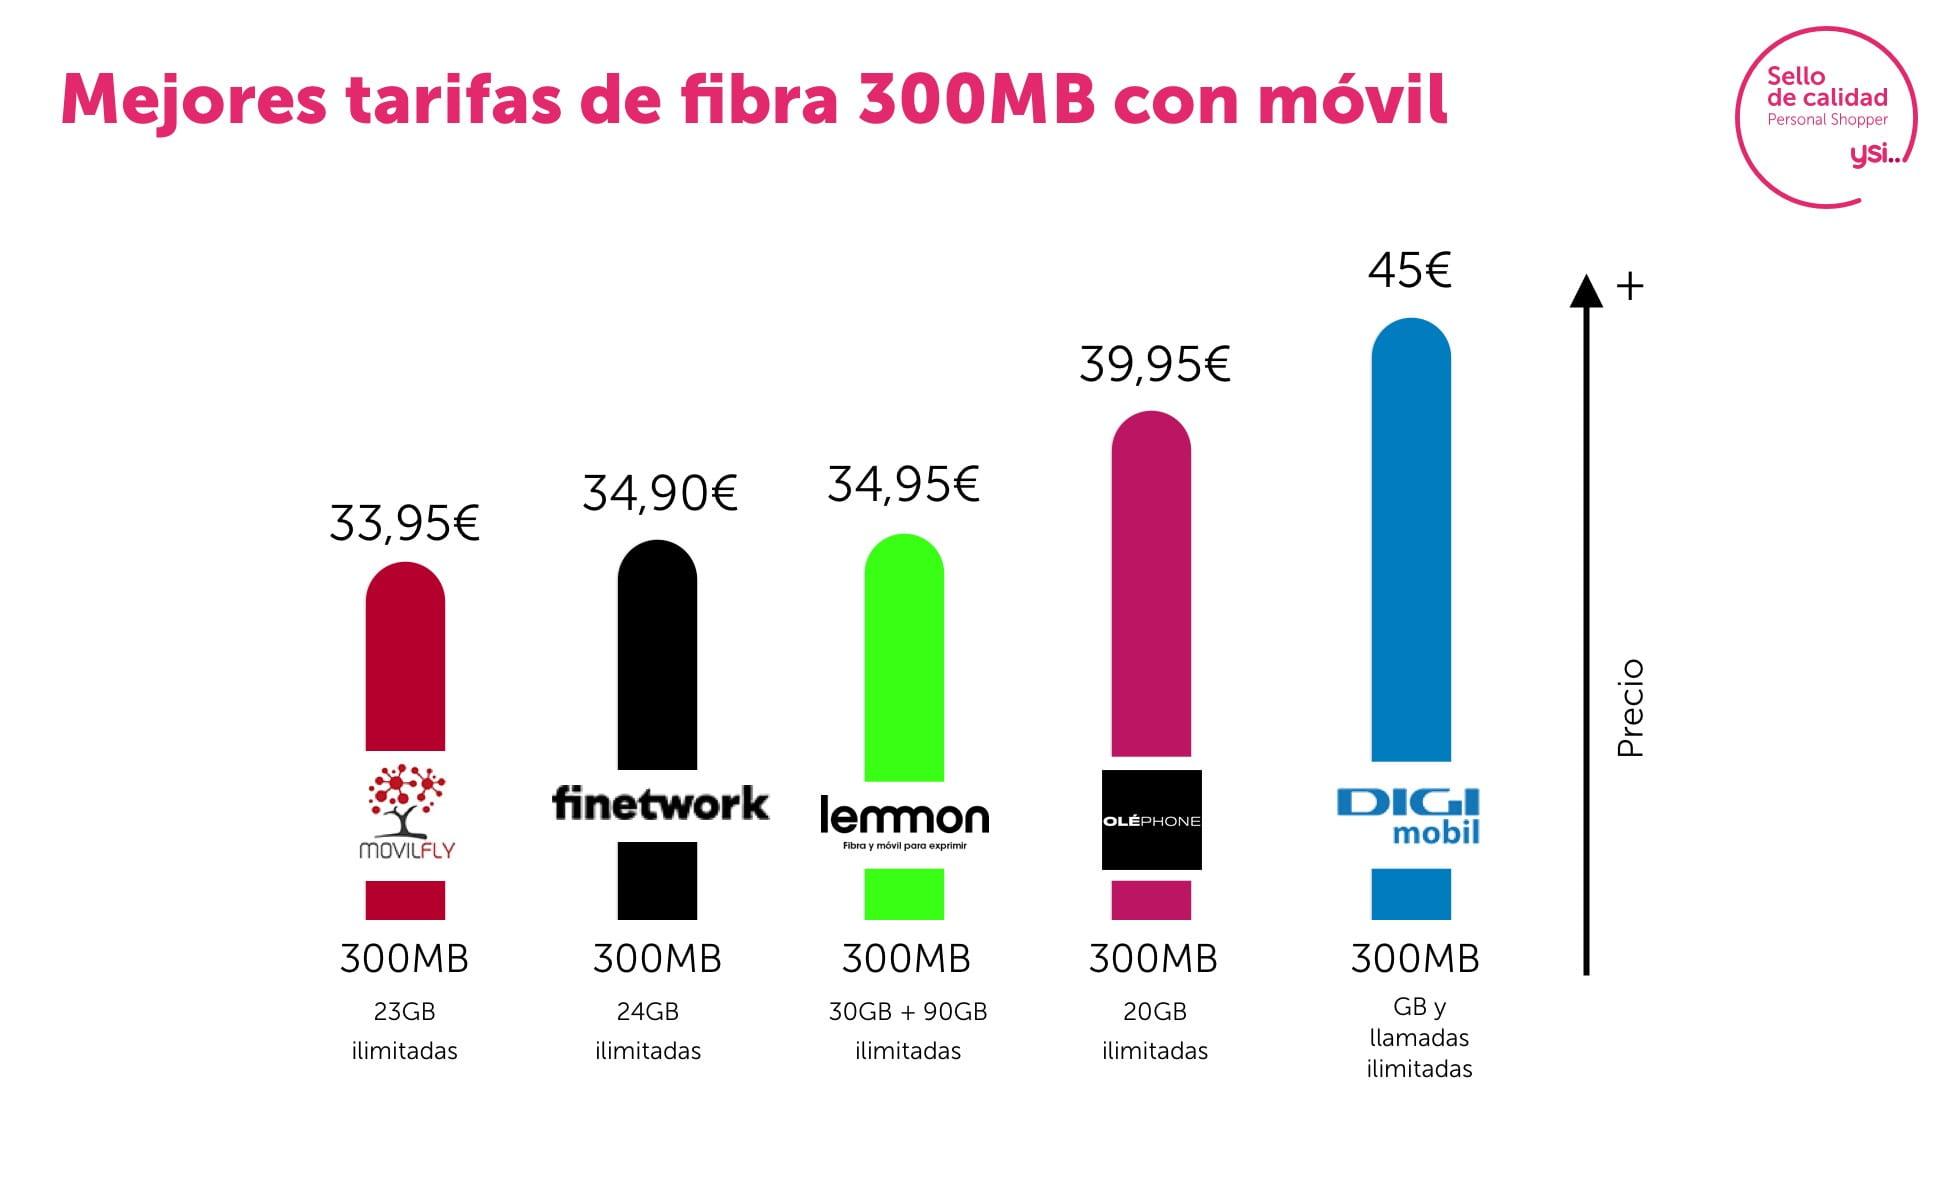 Tarifas fibra 300Mb y móvil